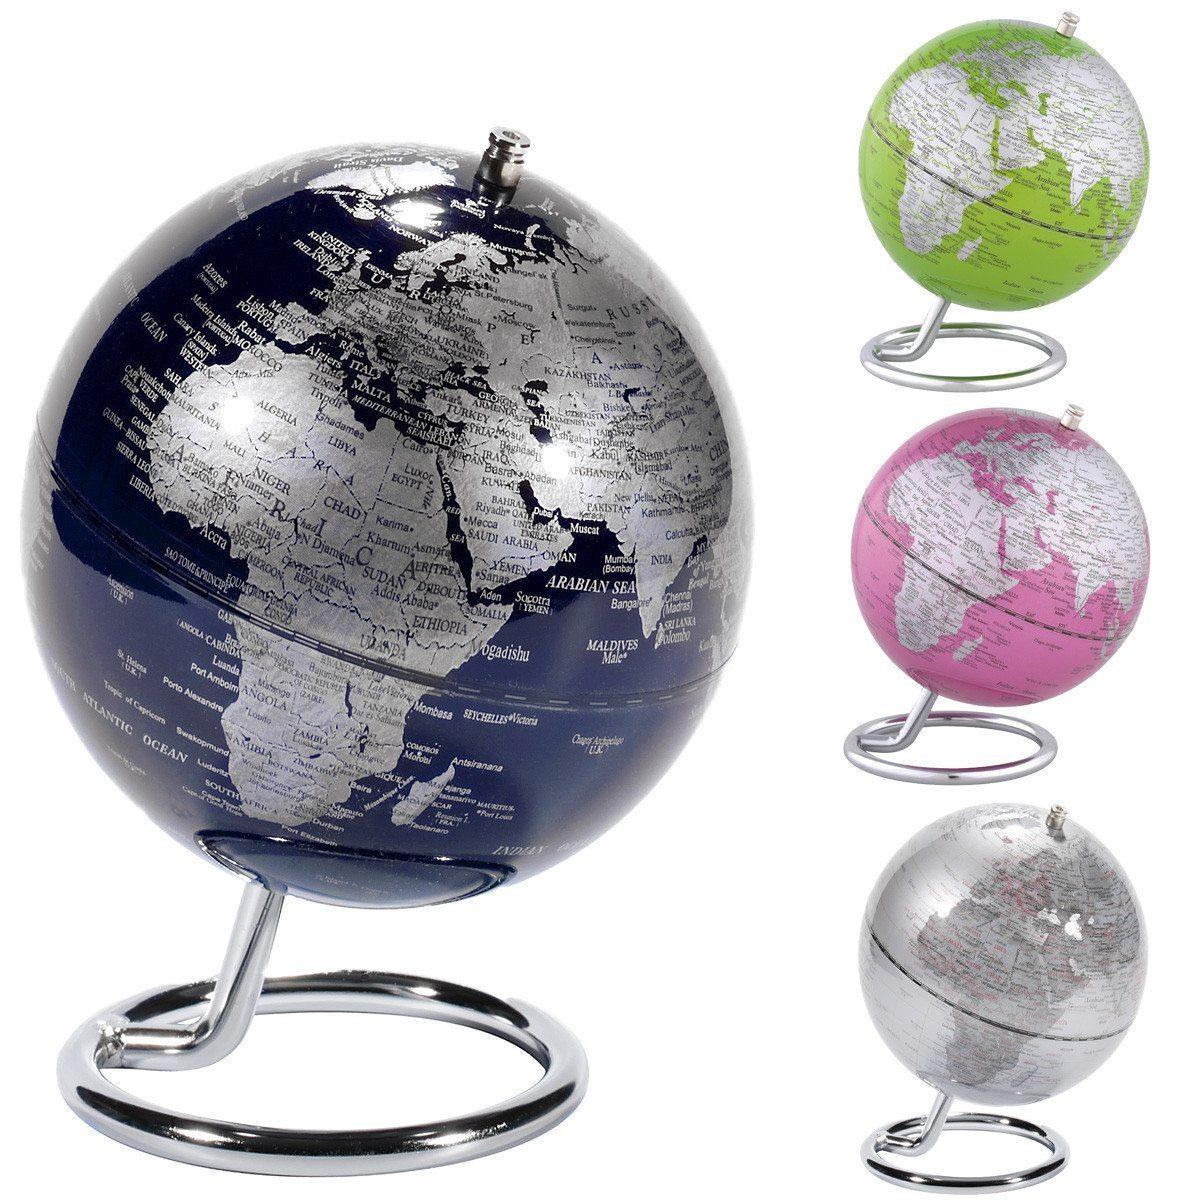 Galilei - Mini Globus